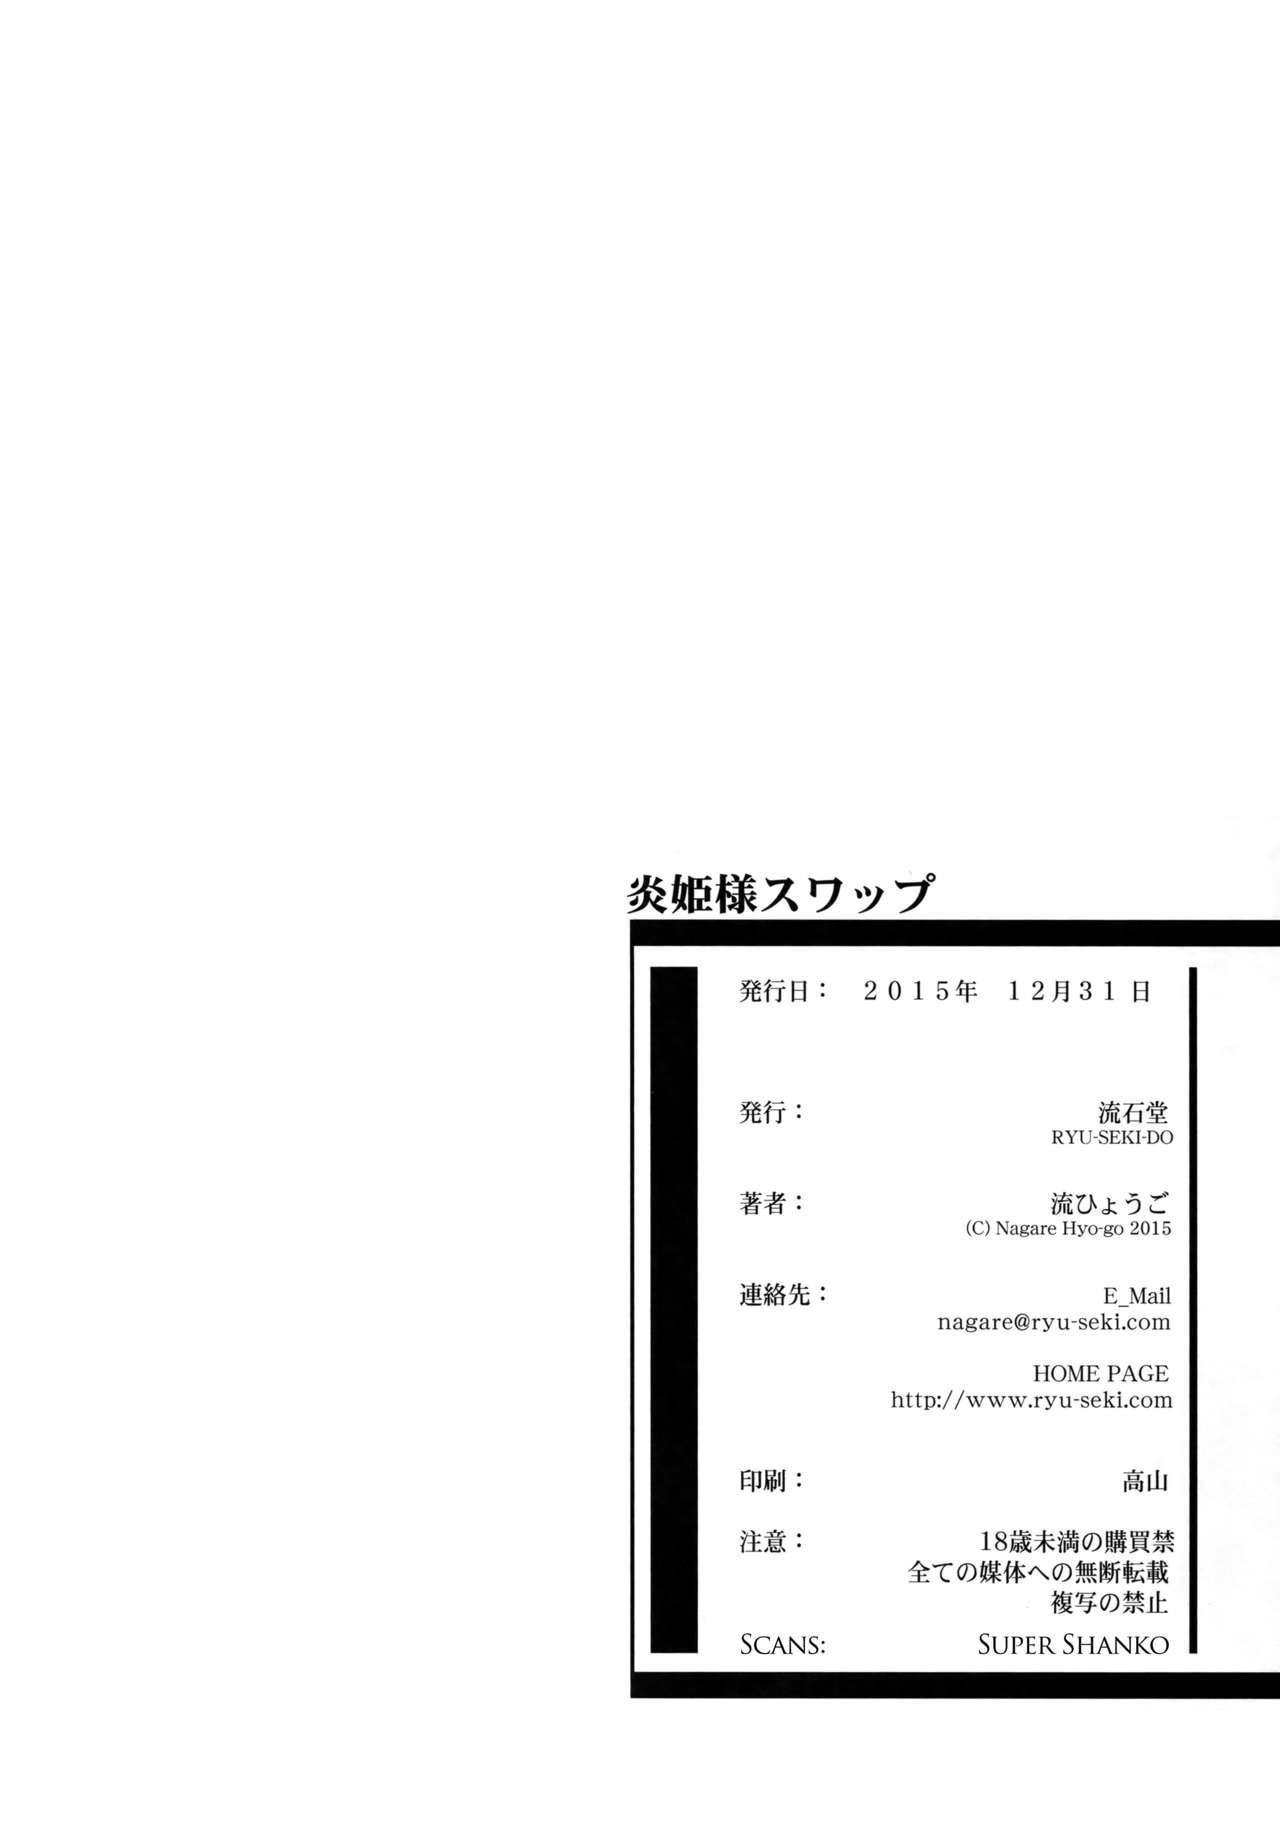 HIMEsama SWAP 28